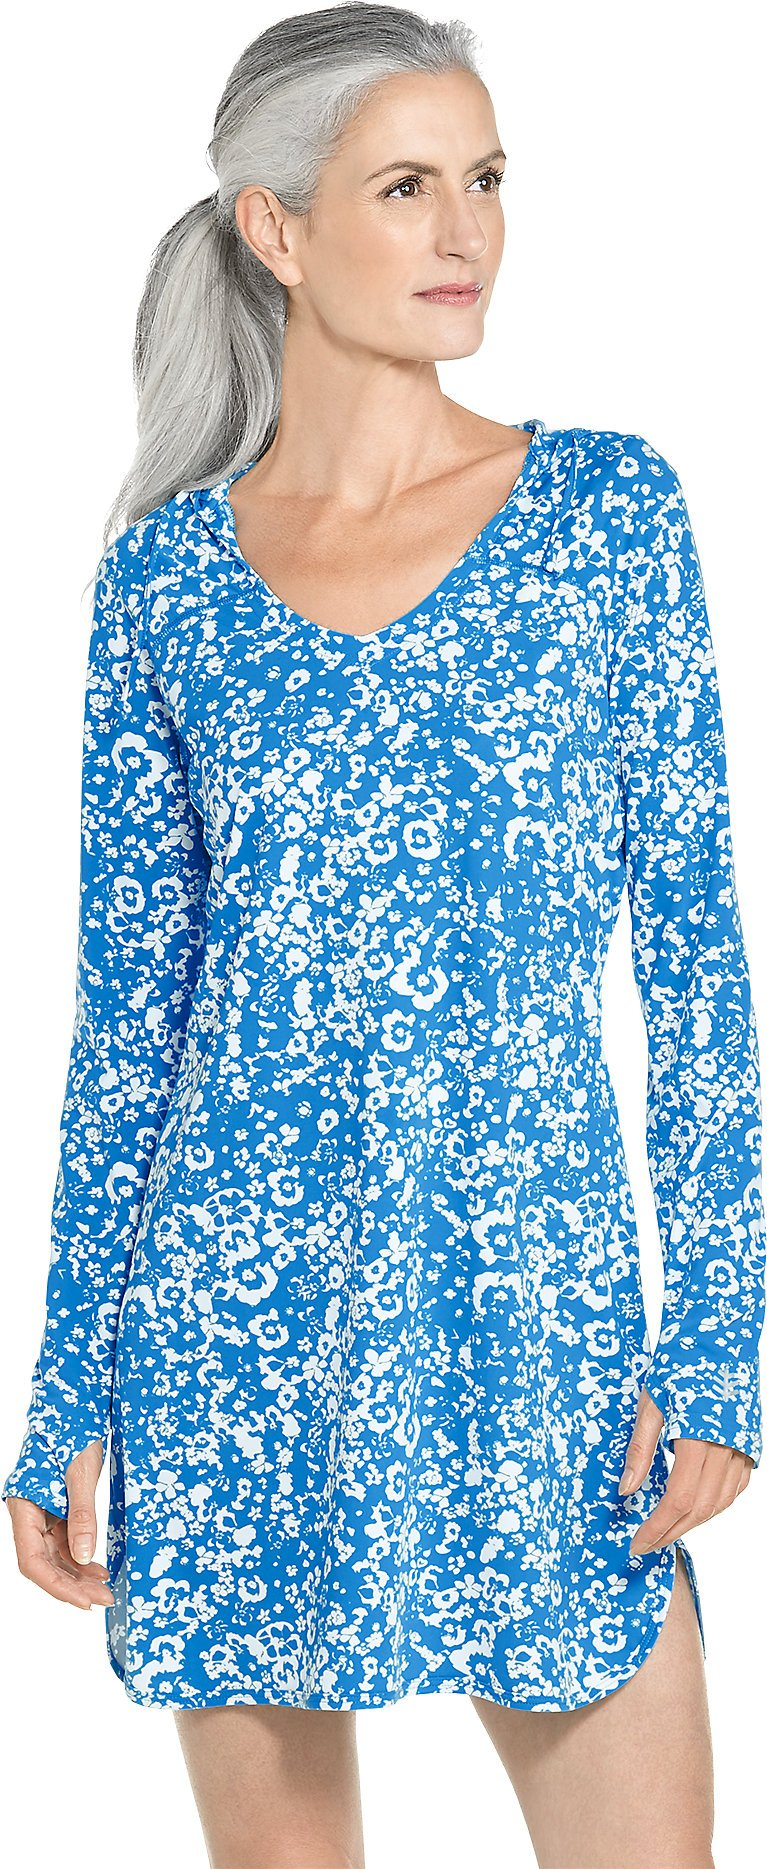 coolibar UPF 50+ Women's Swim Cover-Up Dress - Sun Protective (X-Large- Brilliant Blue Floral)